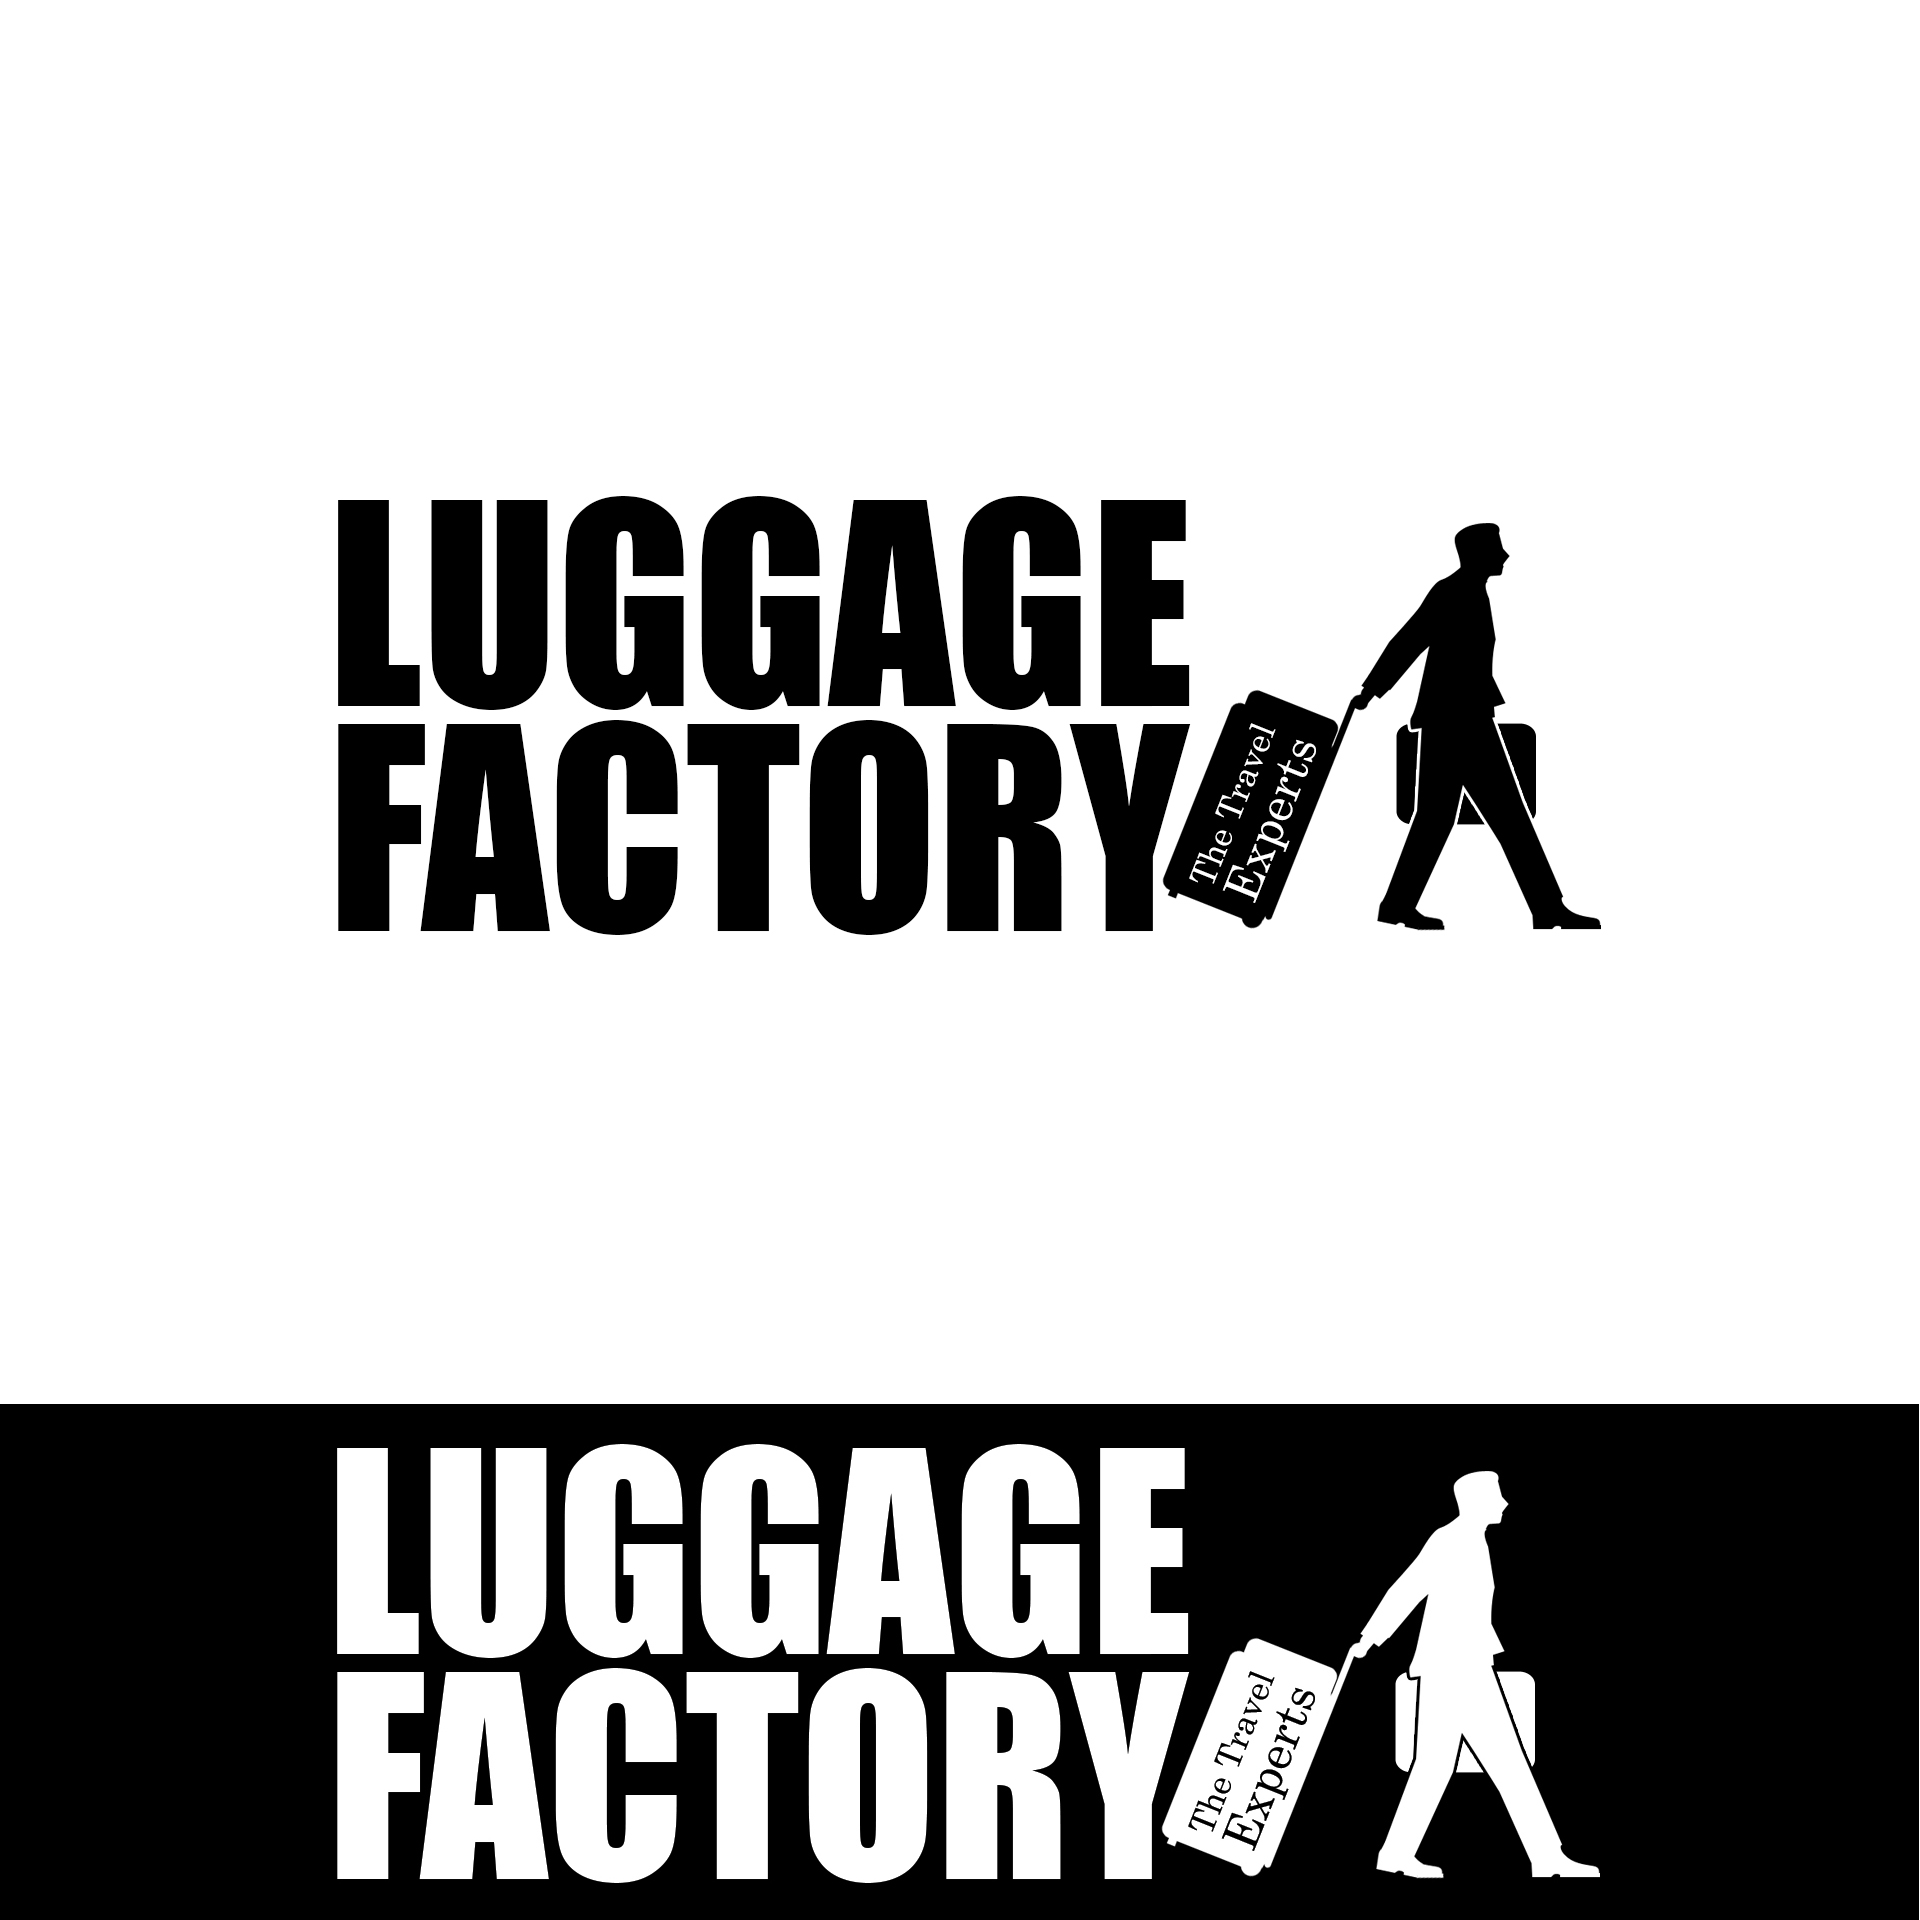 Logo Design by chAnDOS - Entry No. 60 in the Logo Design Contest Creative Logo Design for Luggage Factory.